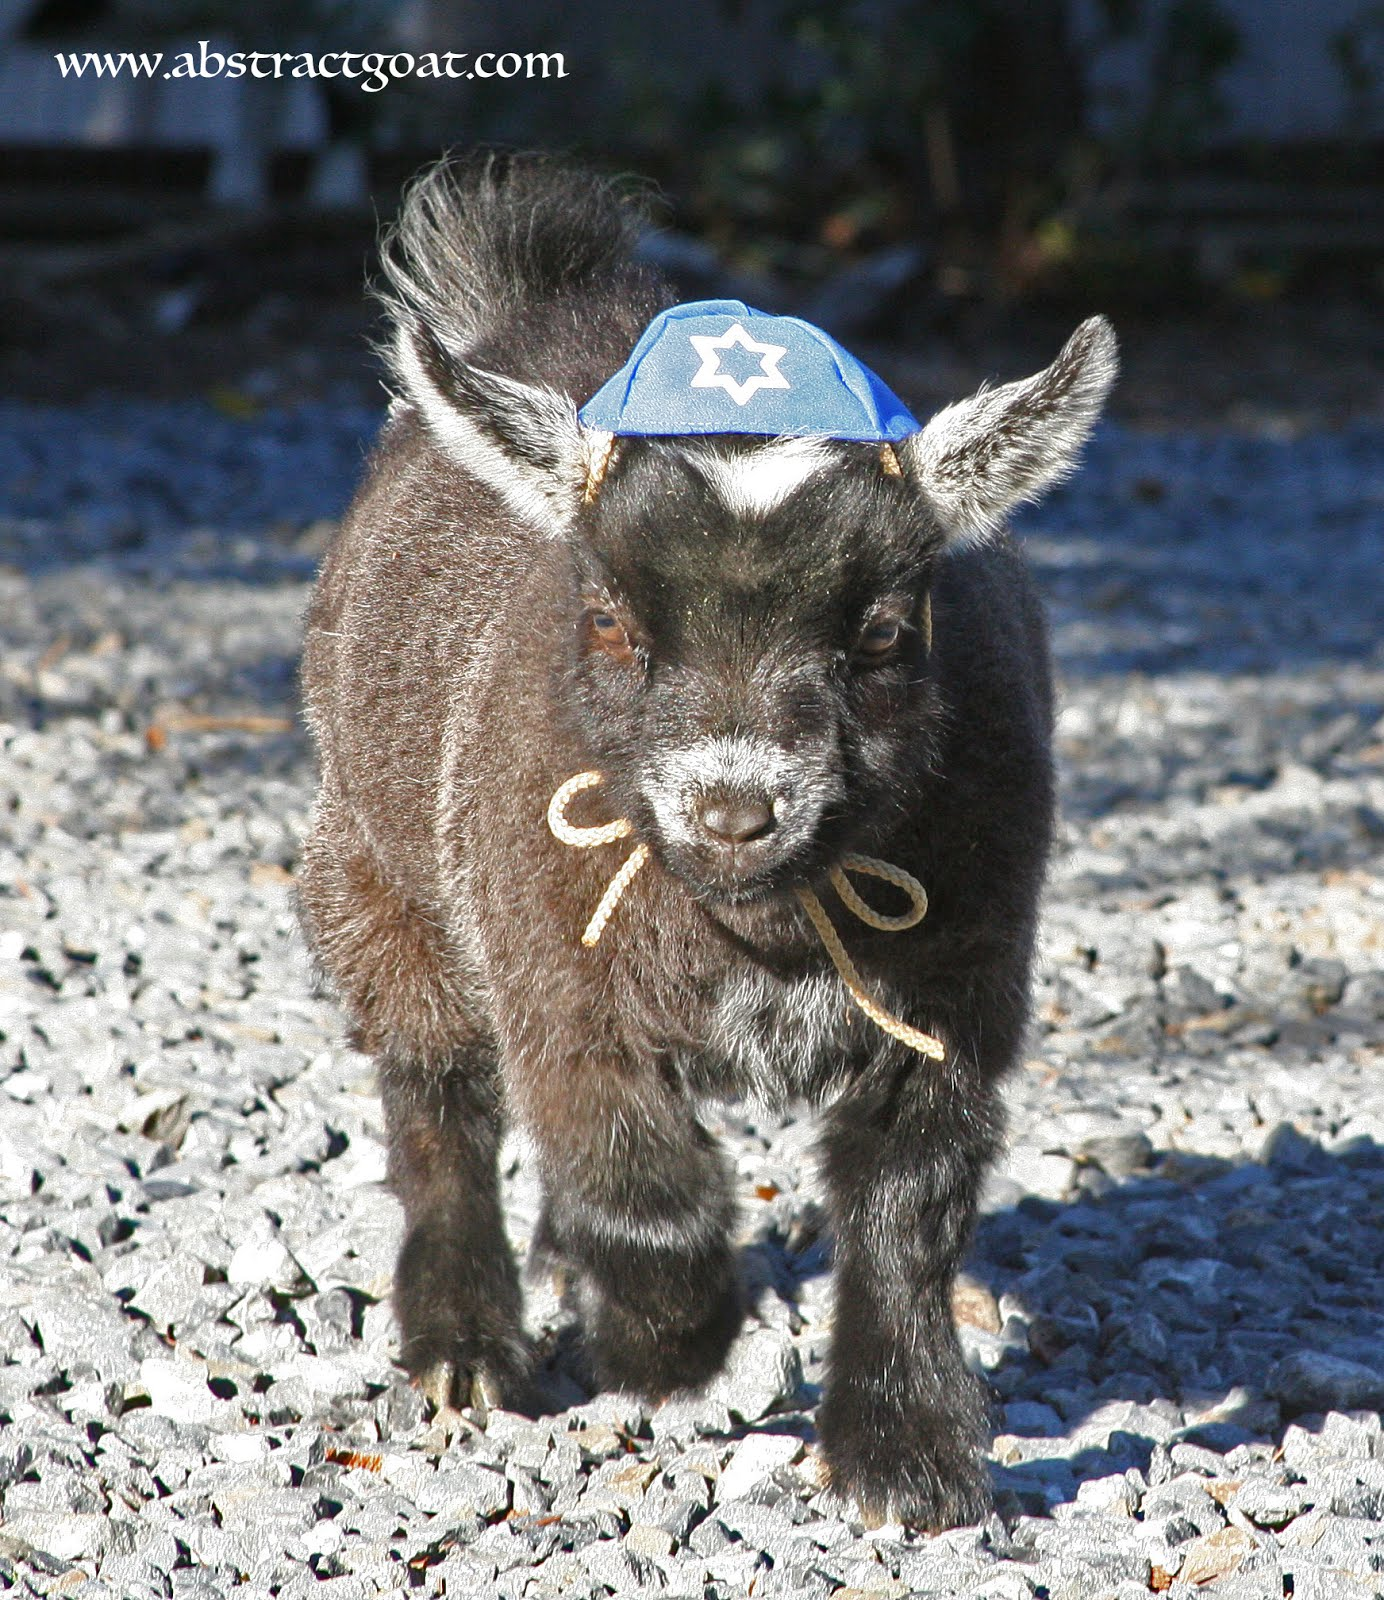 Happy Hanukkah, too!